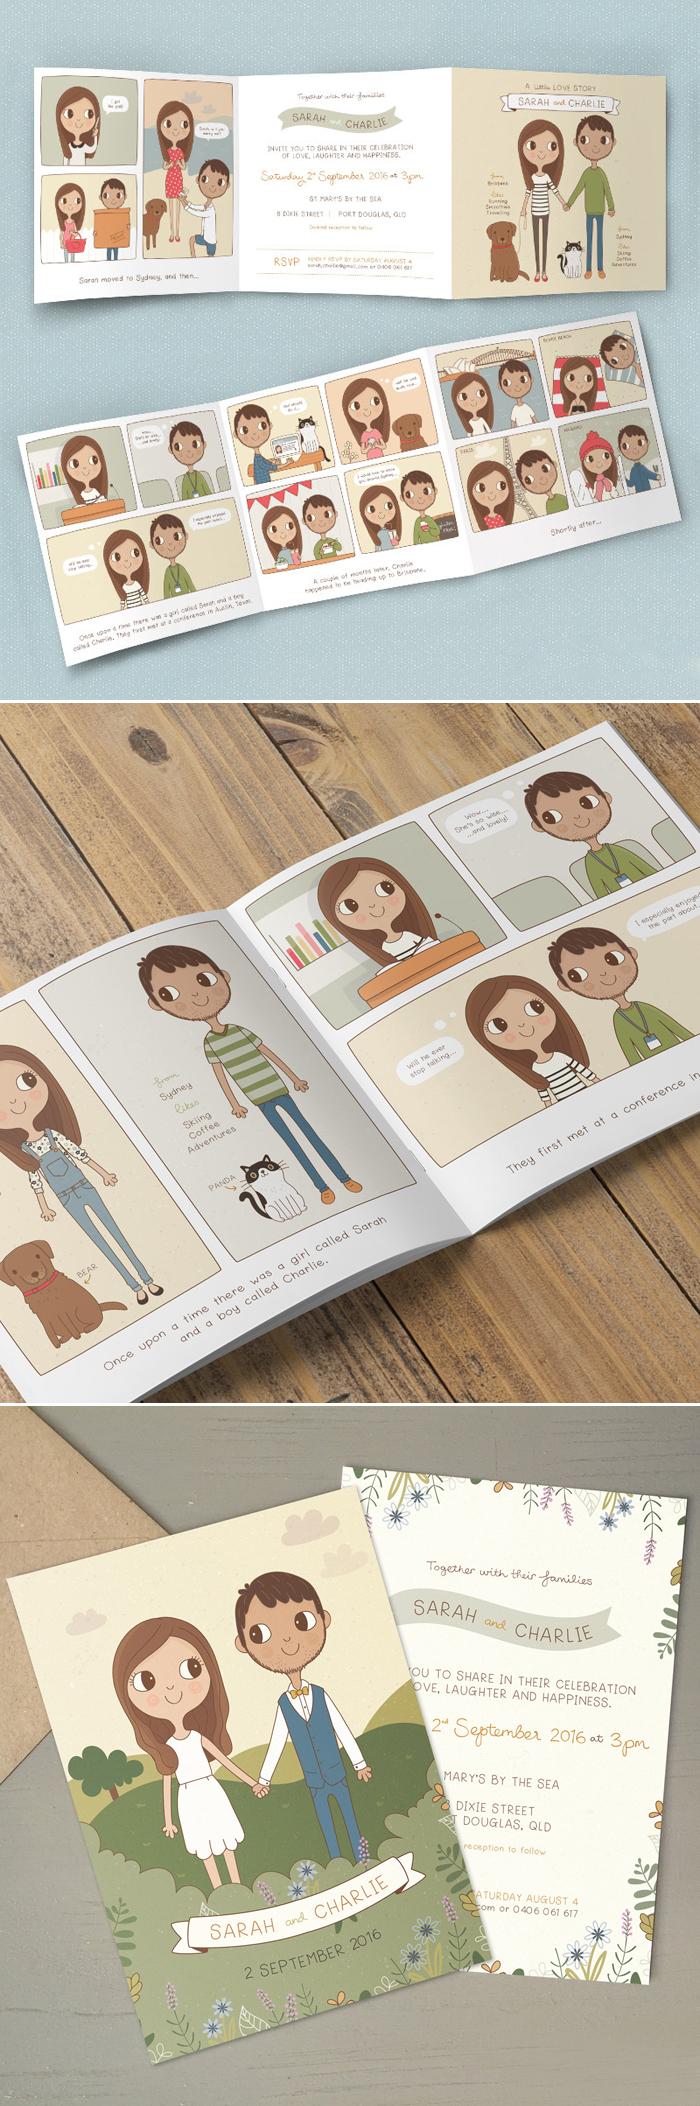 invitationillustrator02-ClareVacha